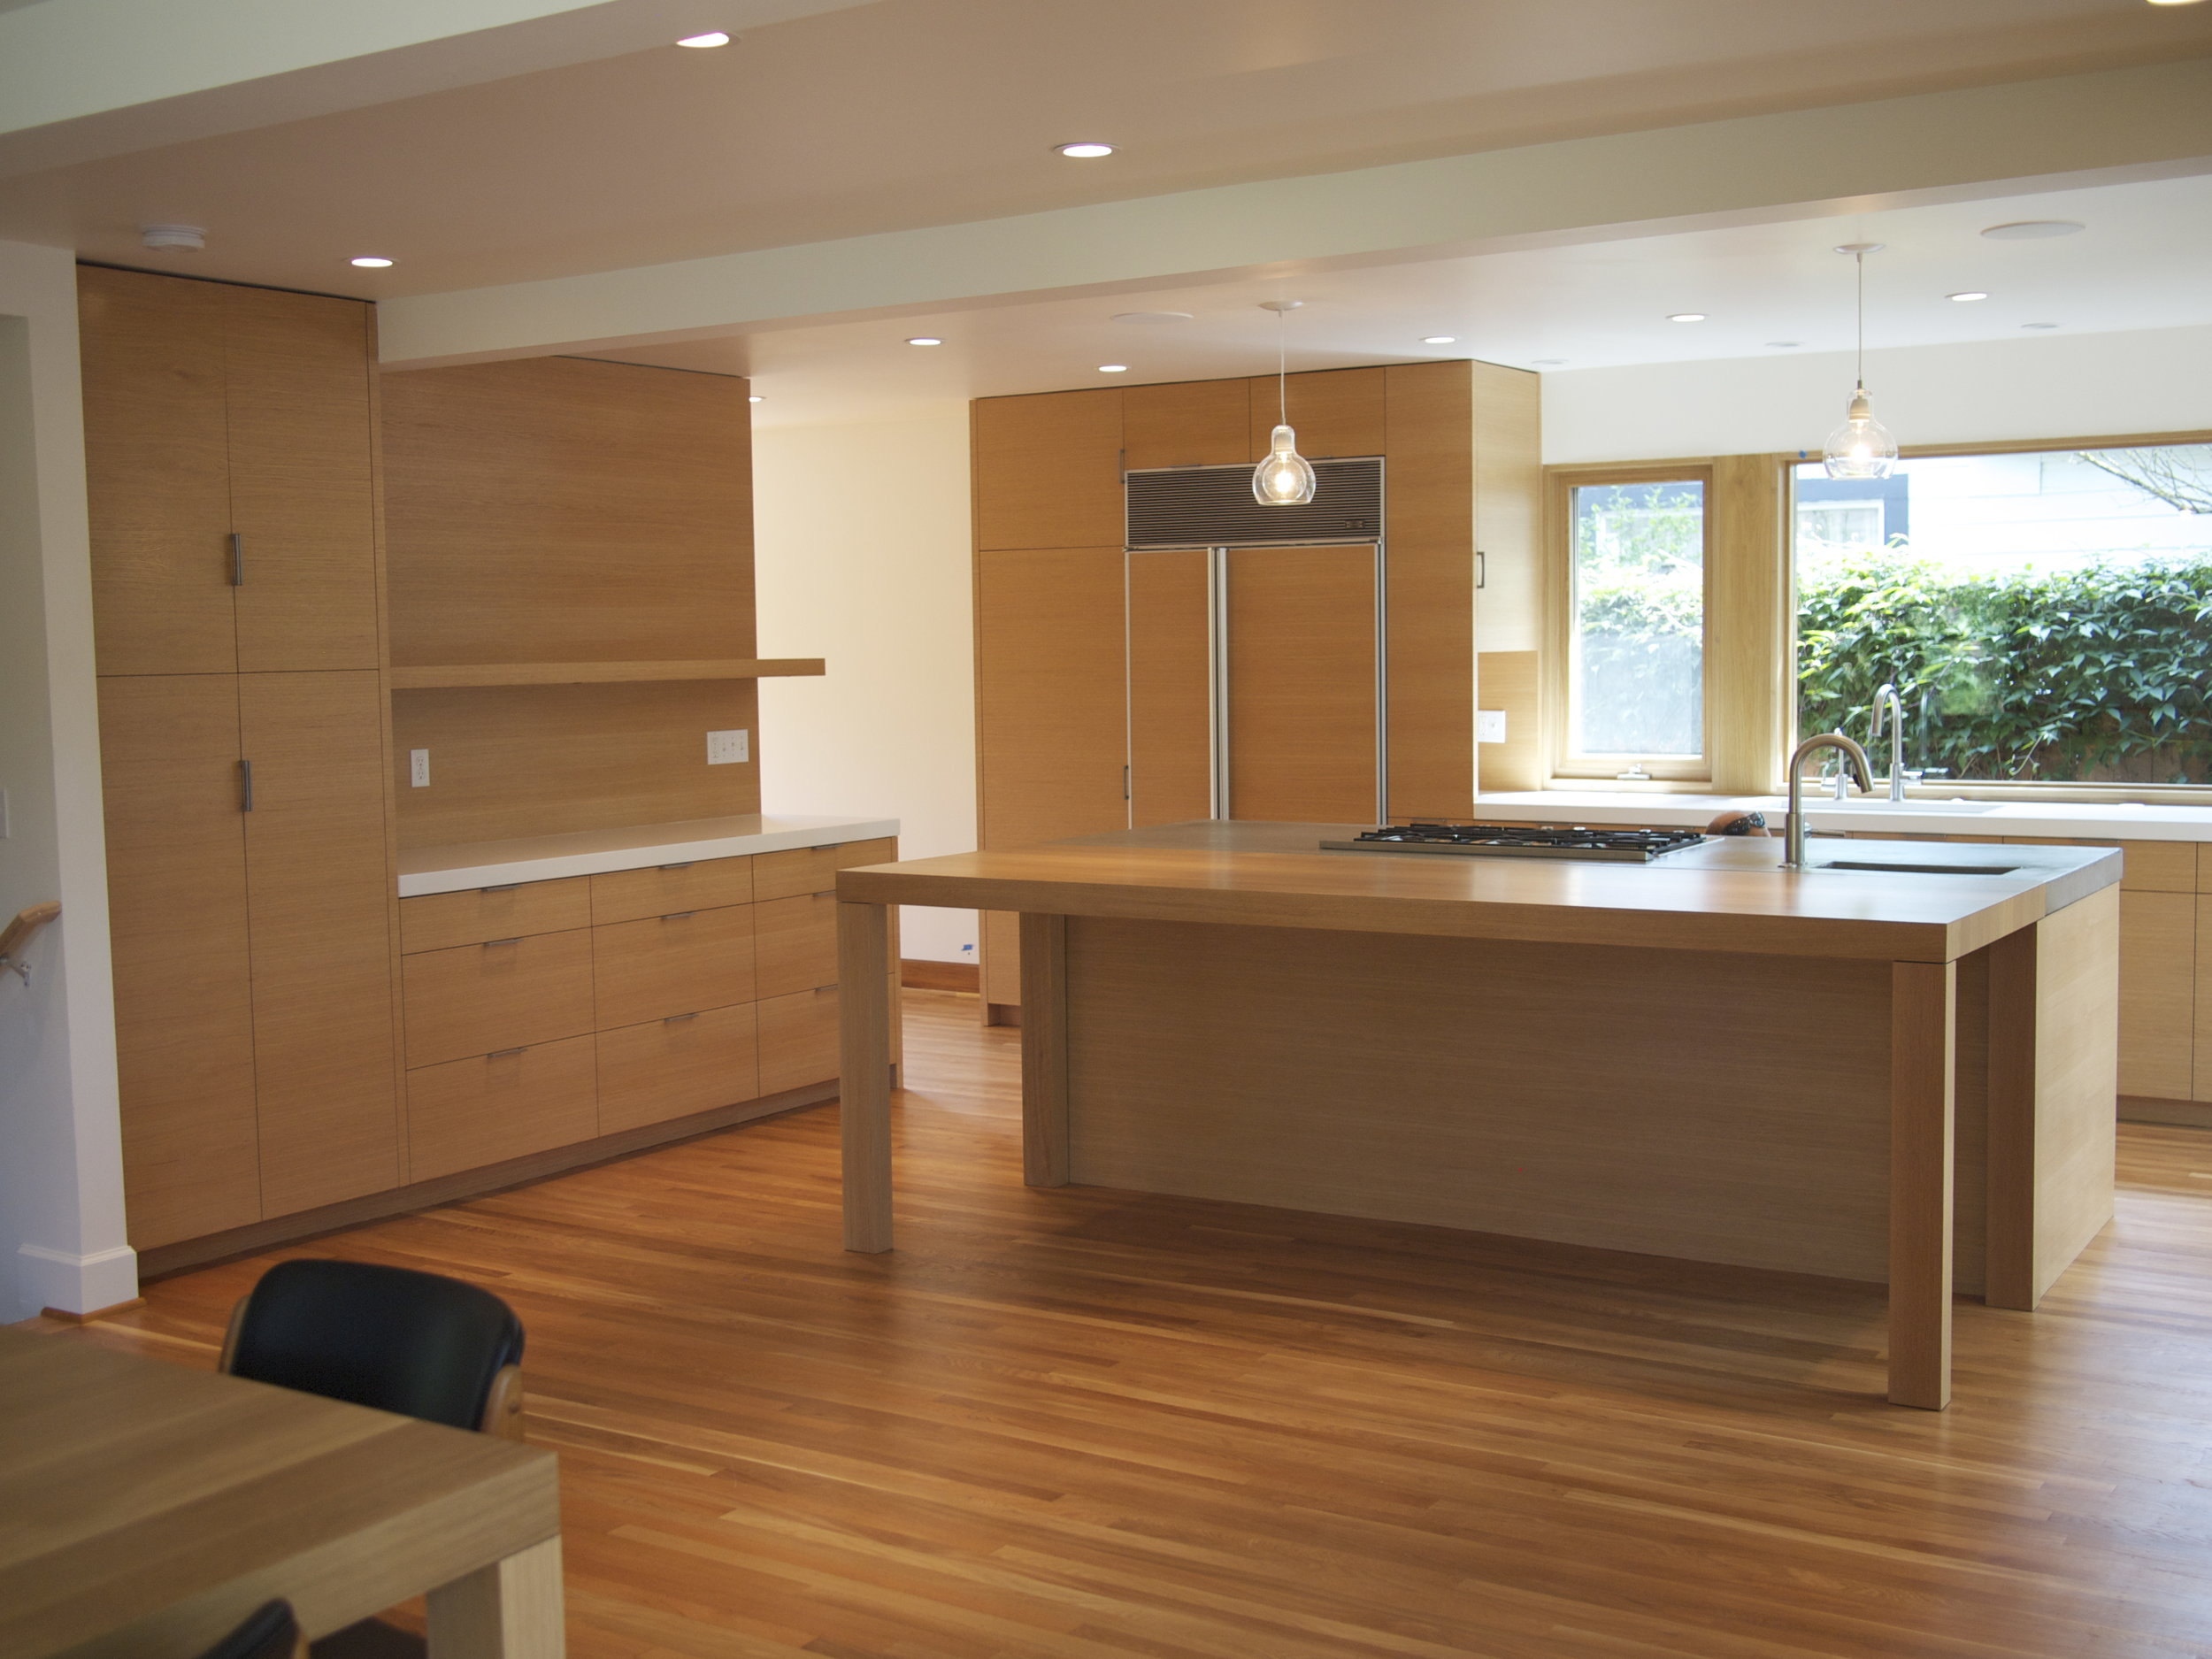 cabinets 9.jpg